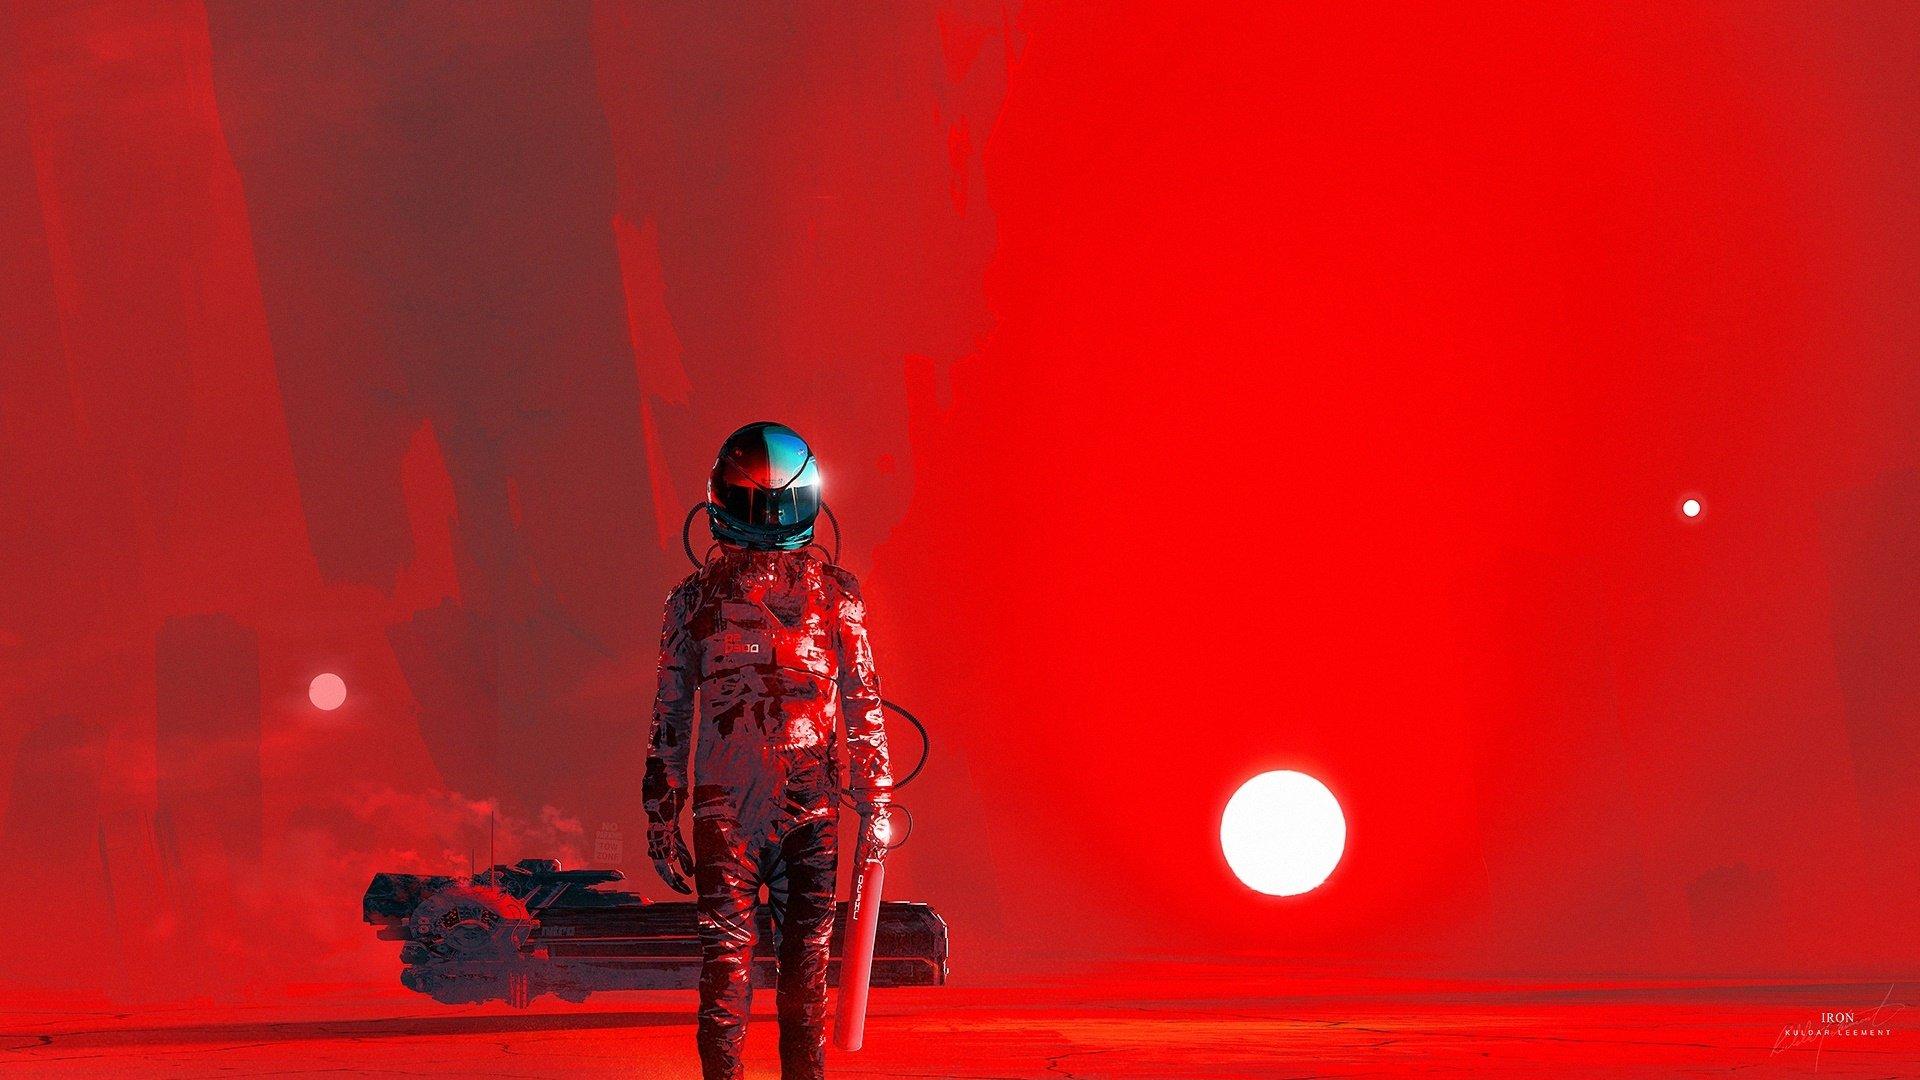 Sci Fi - Astronaut  Red Wallpaper